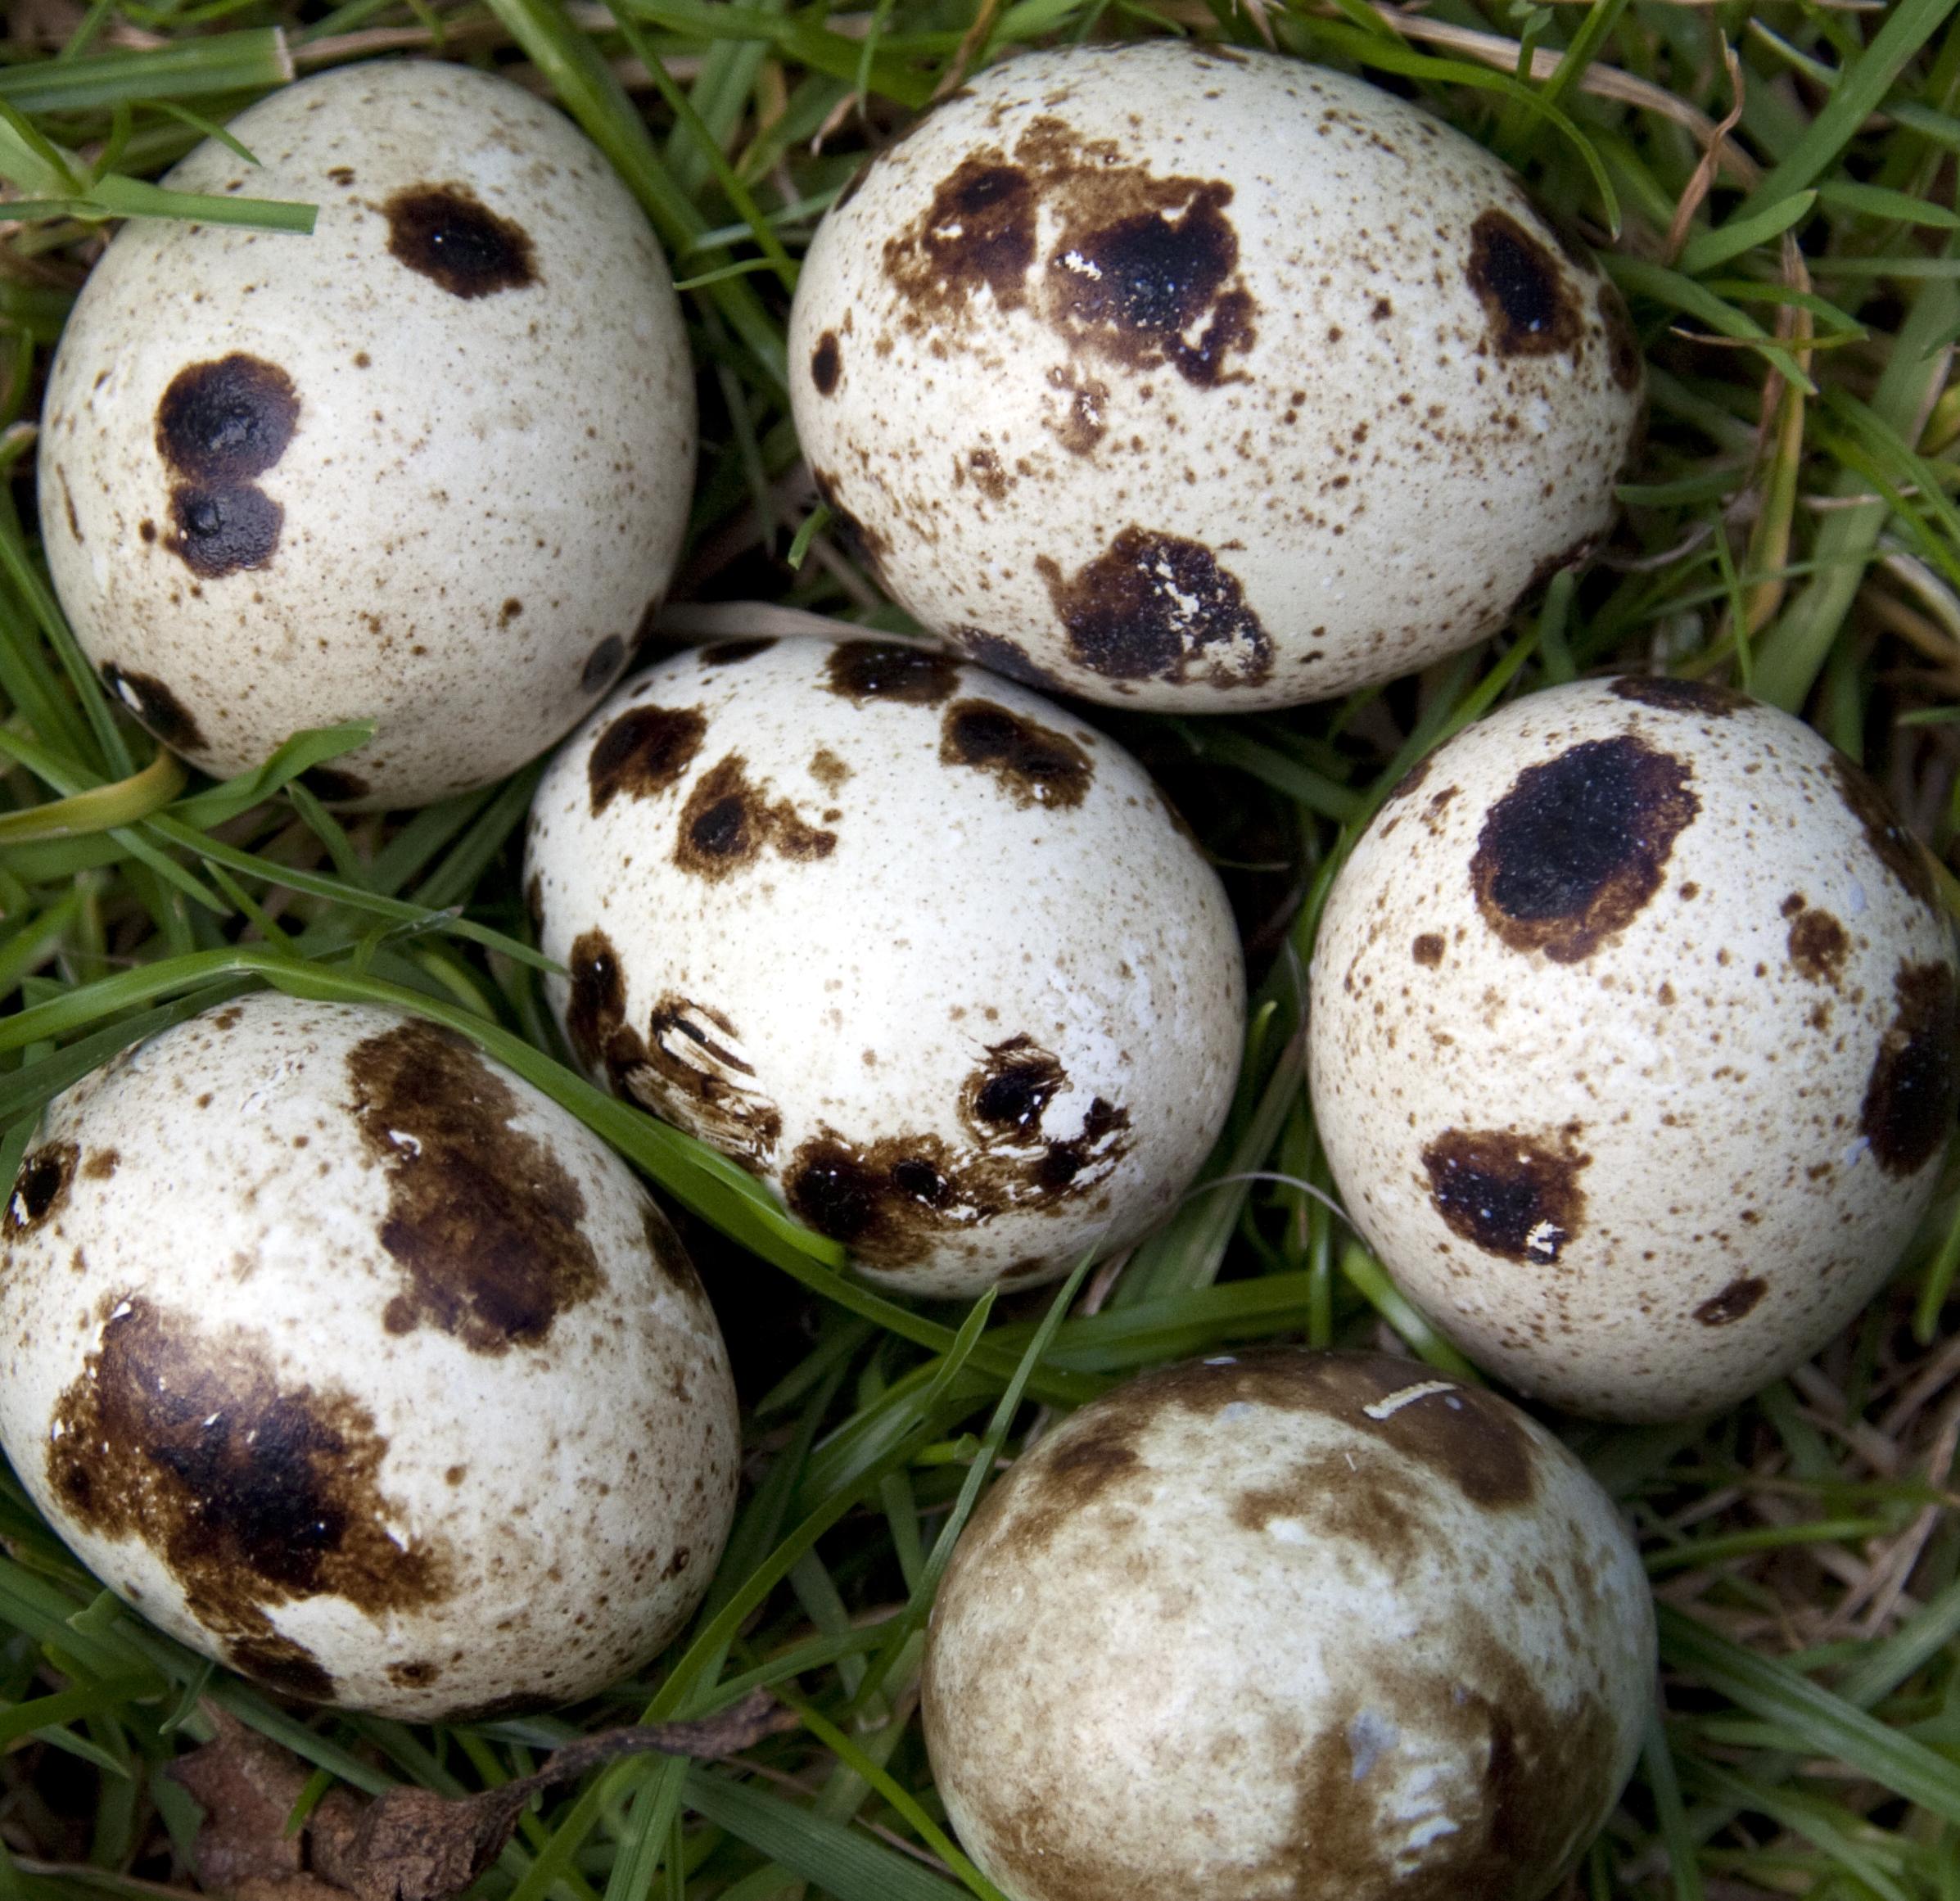 File:Quail eggs (3644007419).jpg - Wikimedia Commons